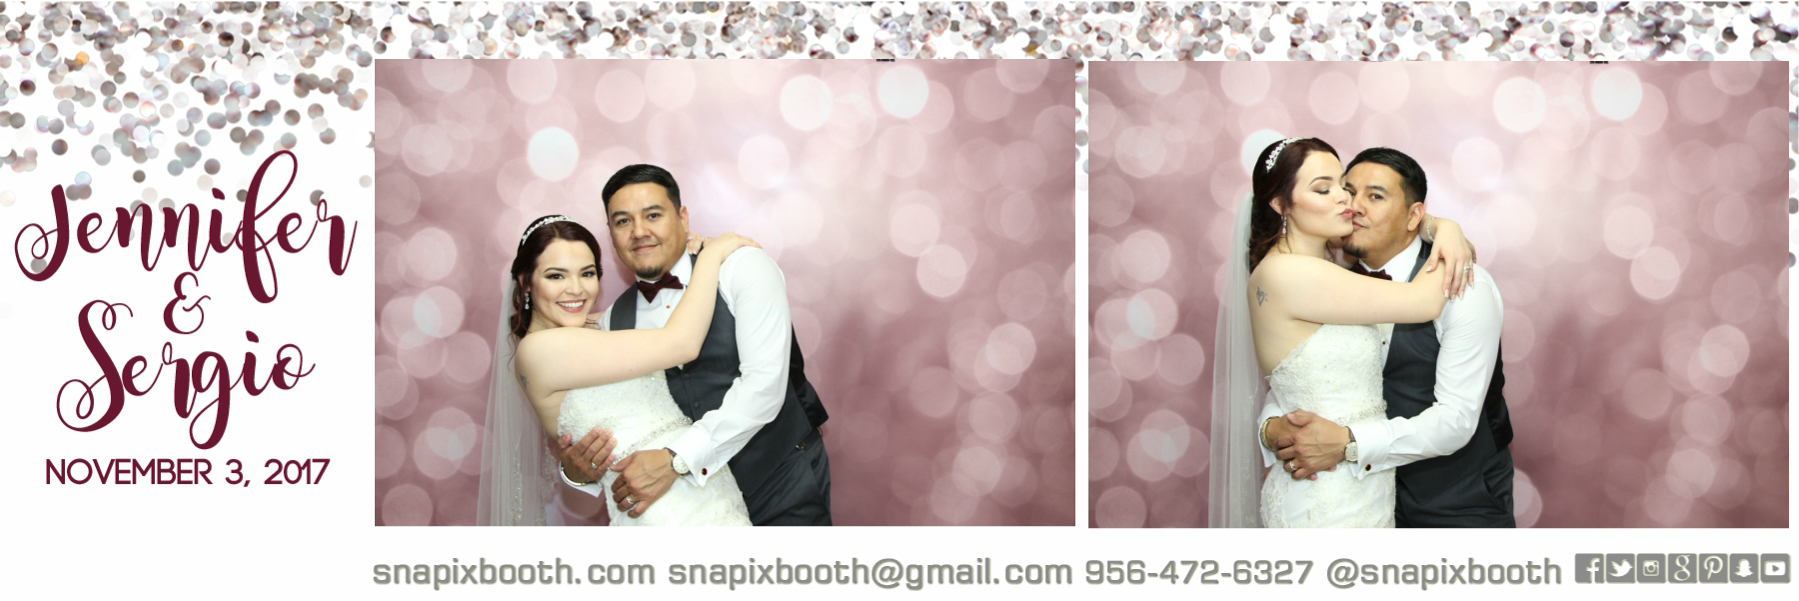 Jennifer & Sergio